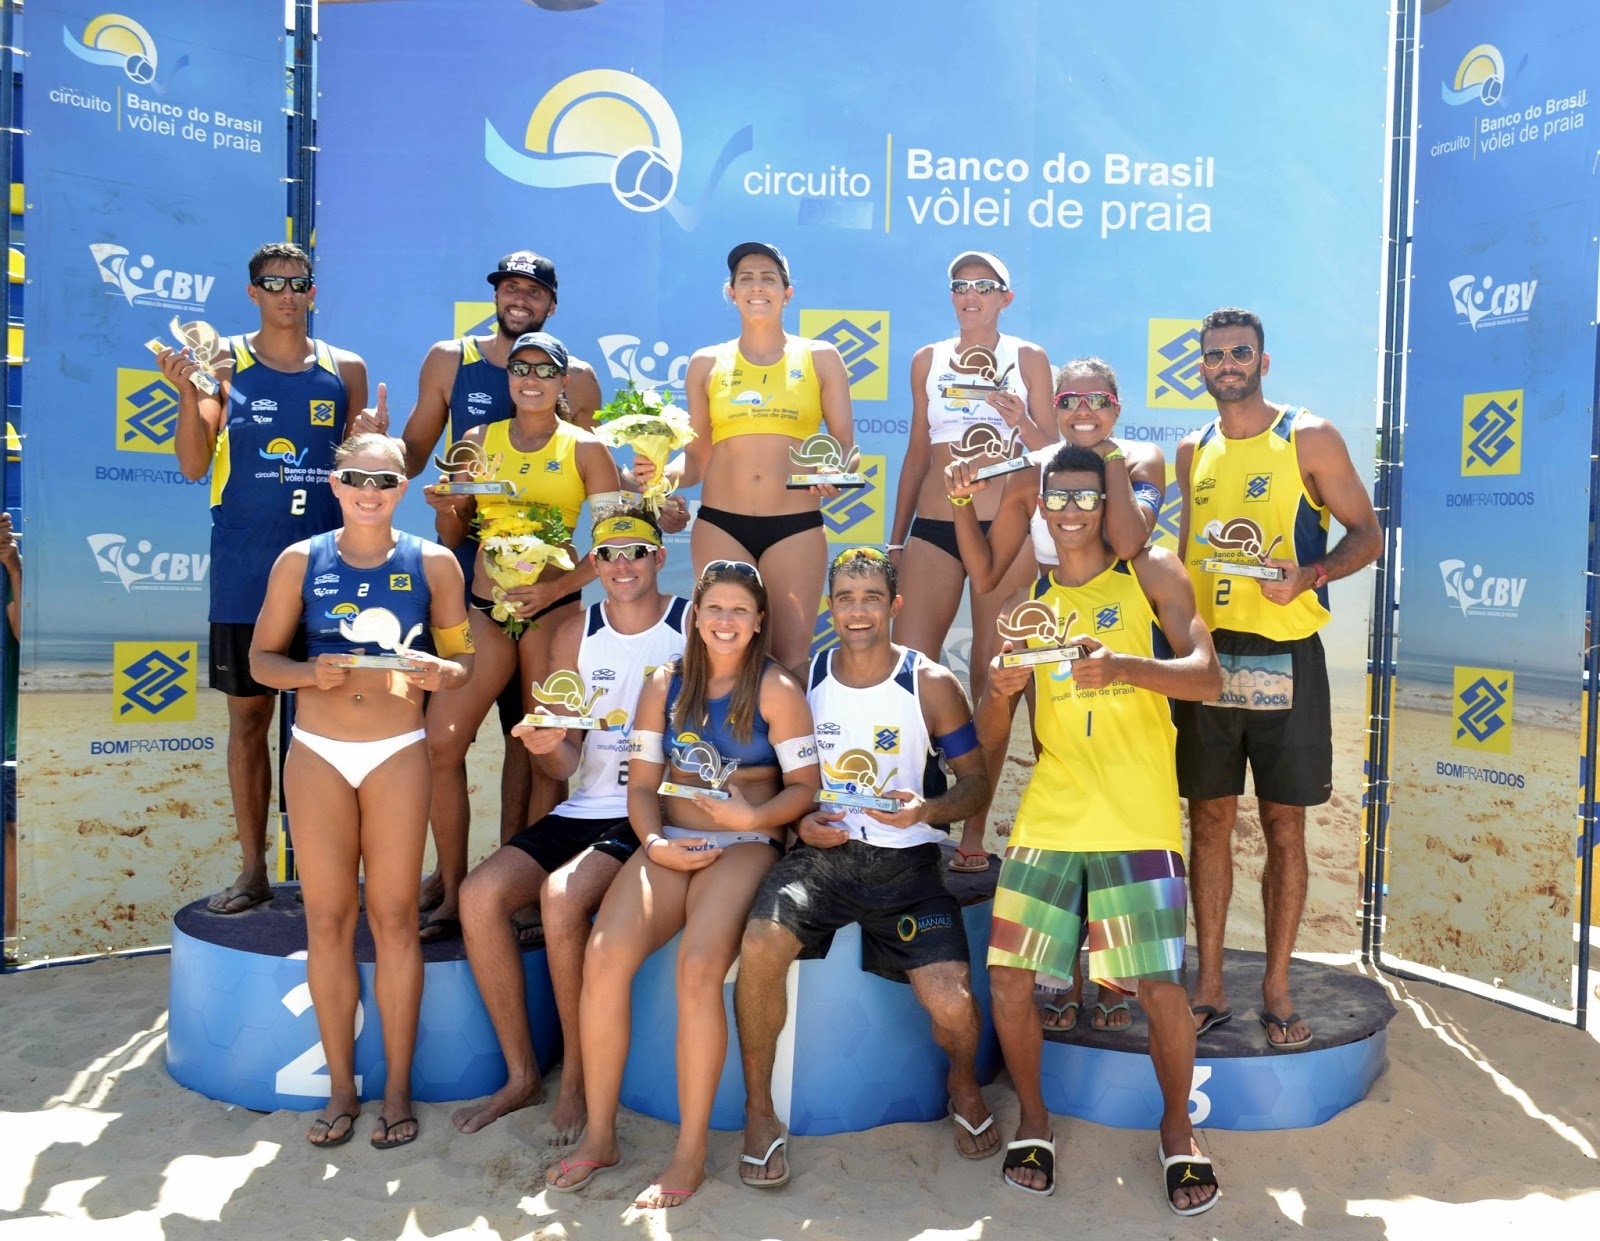 Circuito Banco Do Brasil : Dudu servan art director circuito banco do brasil de corrida